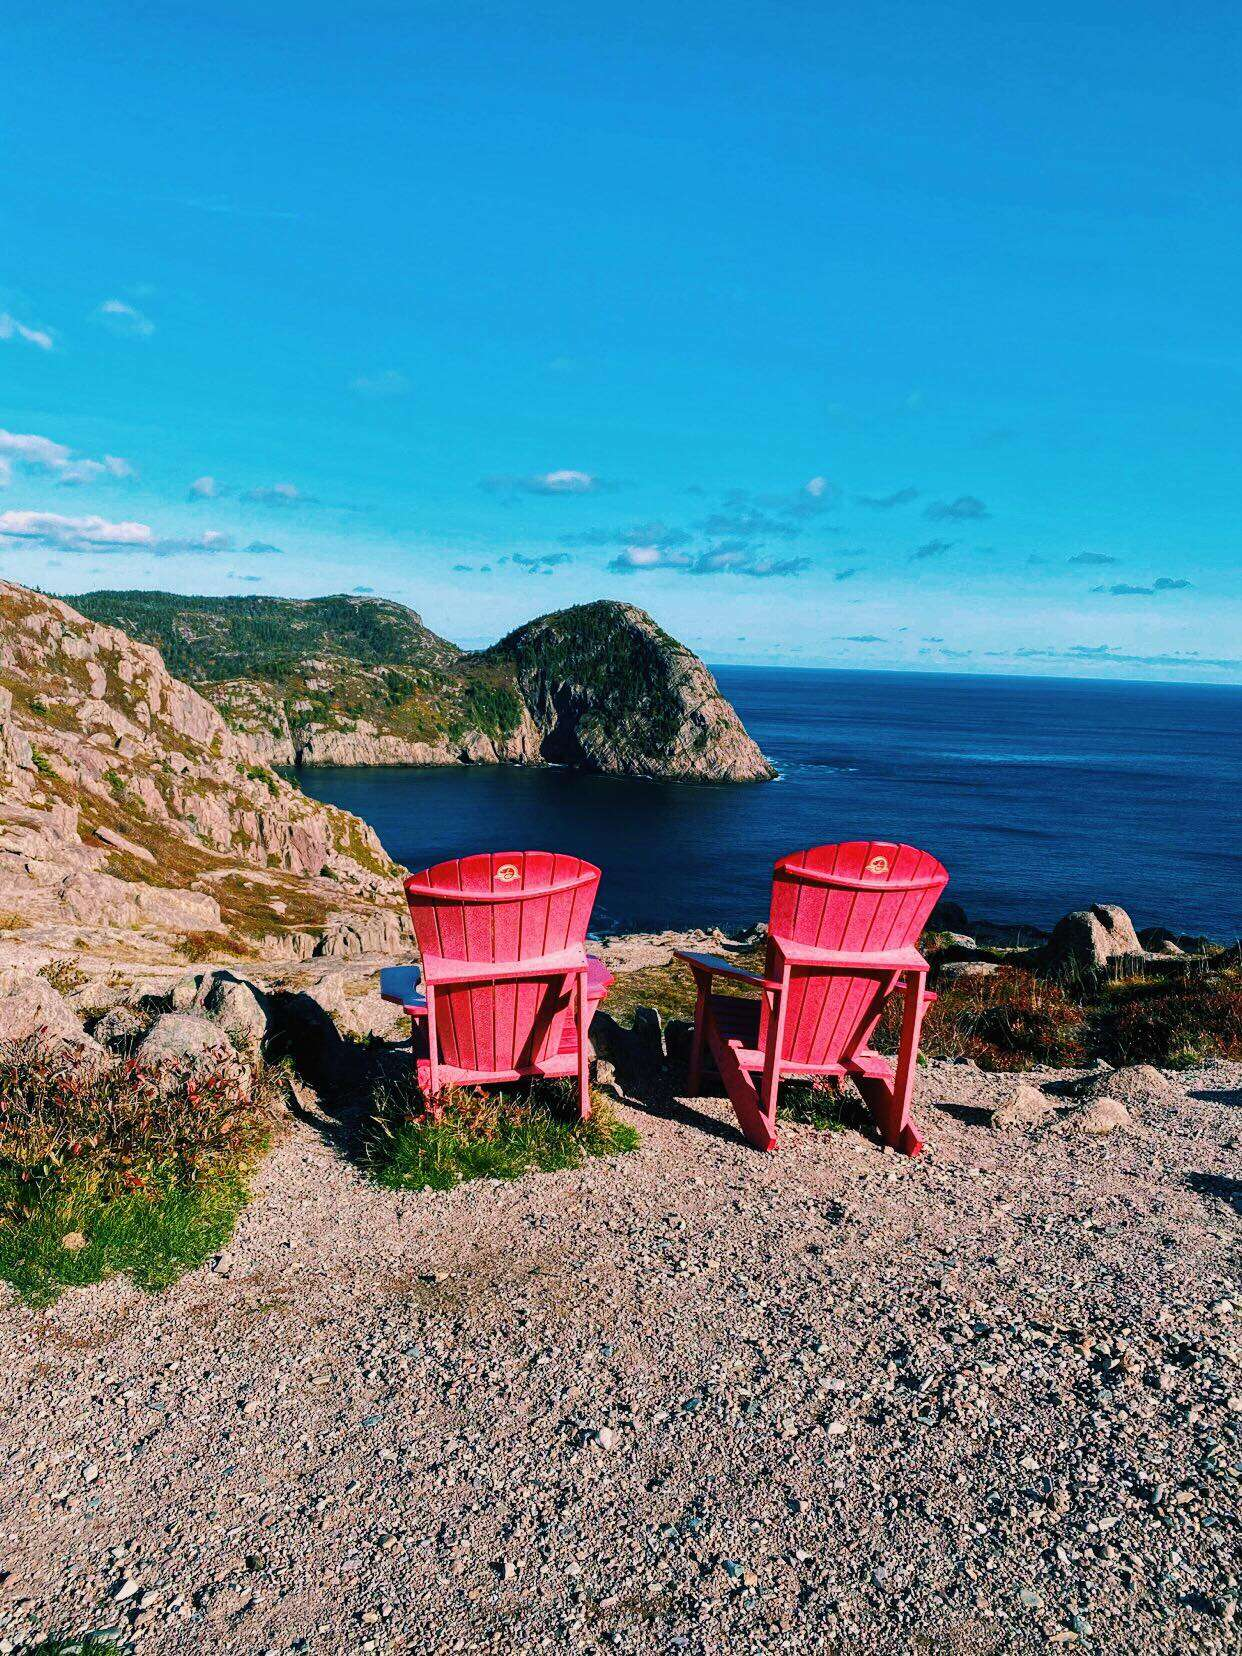 Atlantic Bubble Trip to St. John's Newfoundland!